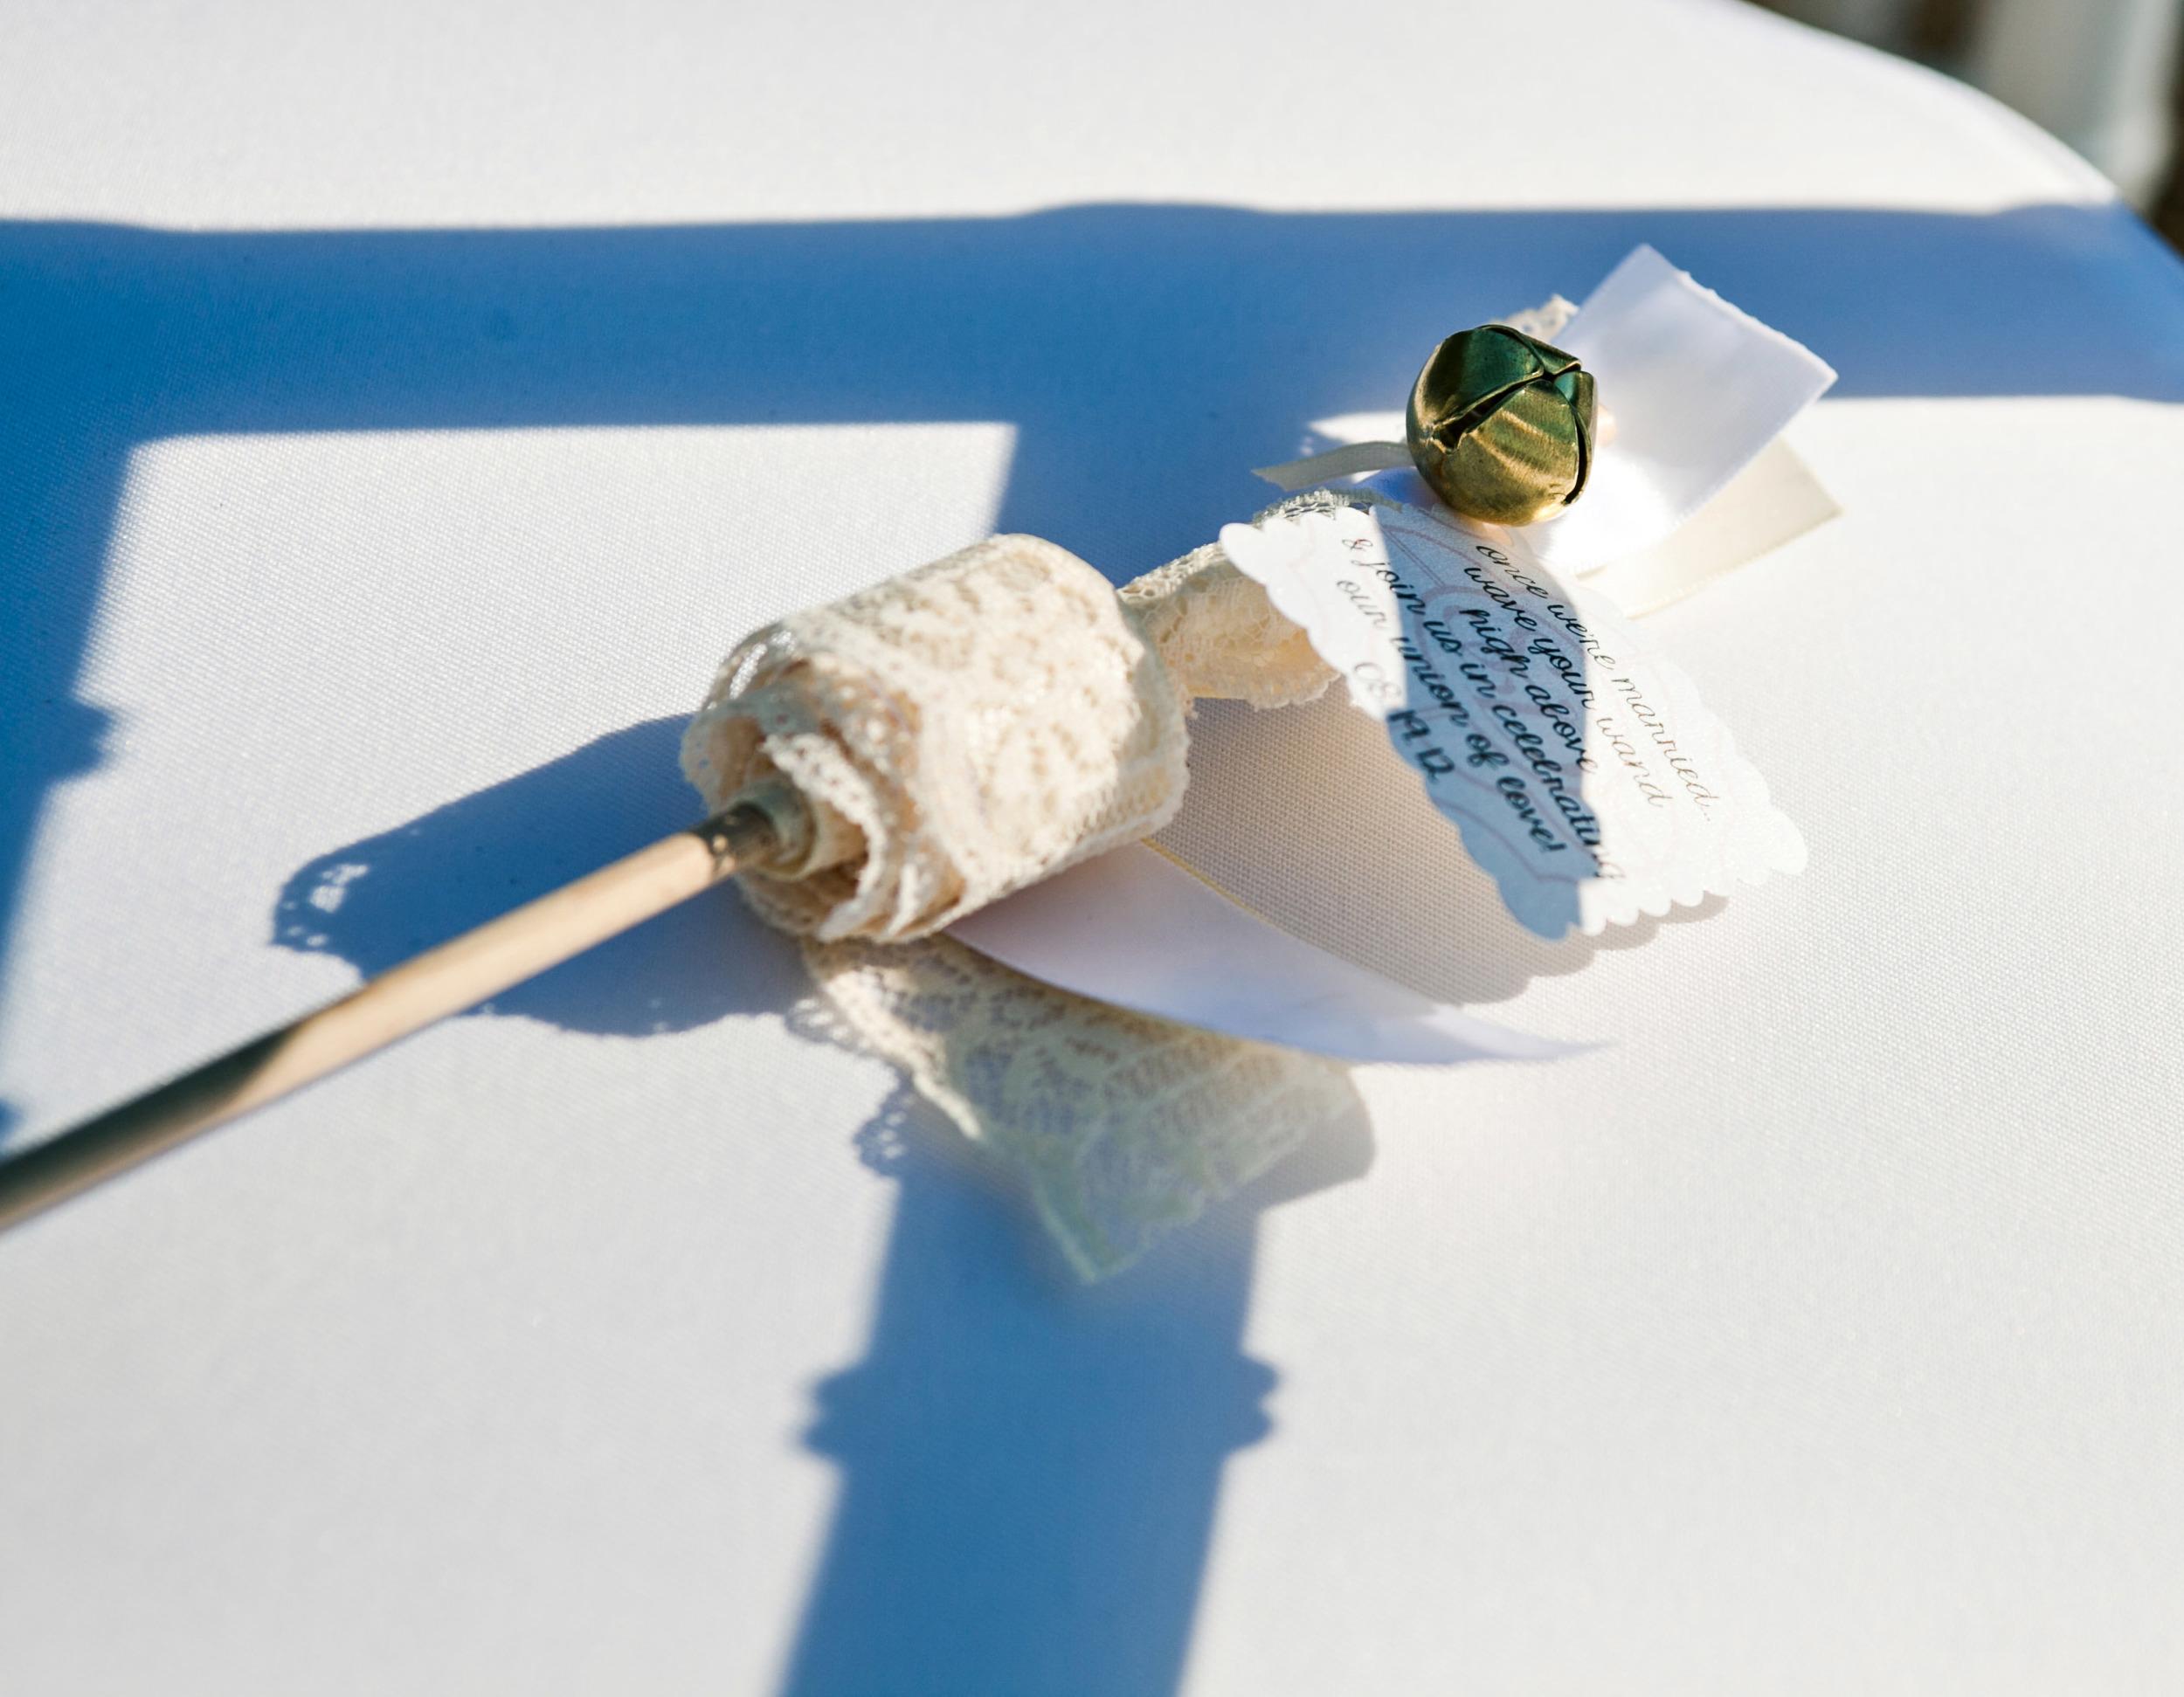 17. ceremony wands, lace ceremony wands, white wedding ideas, vineyard ceremony, summer wedding, napa wedding.jpg